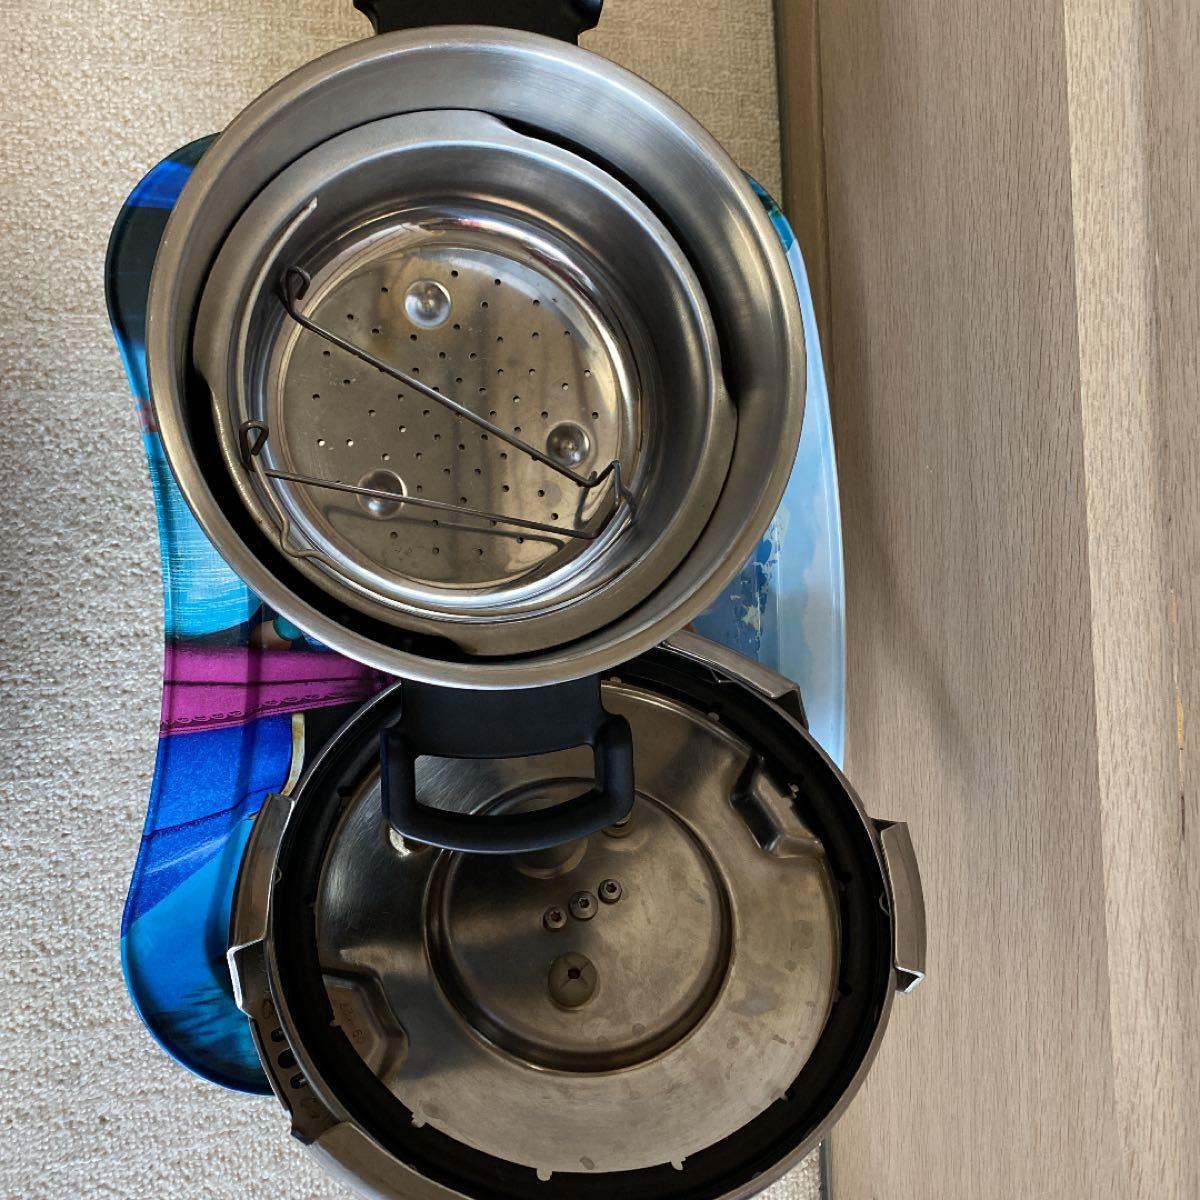 T-fal 圧力鍋 家庭用4.5L IH対応